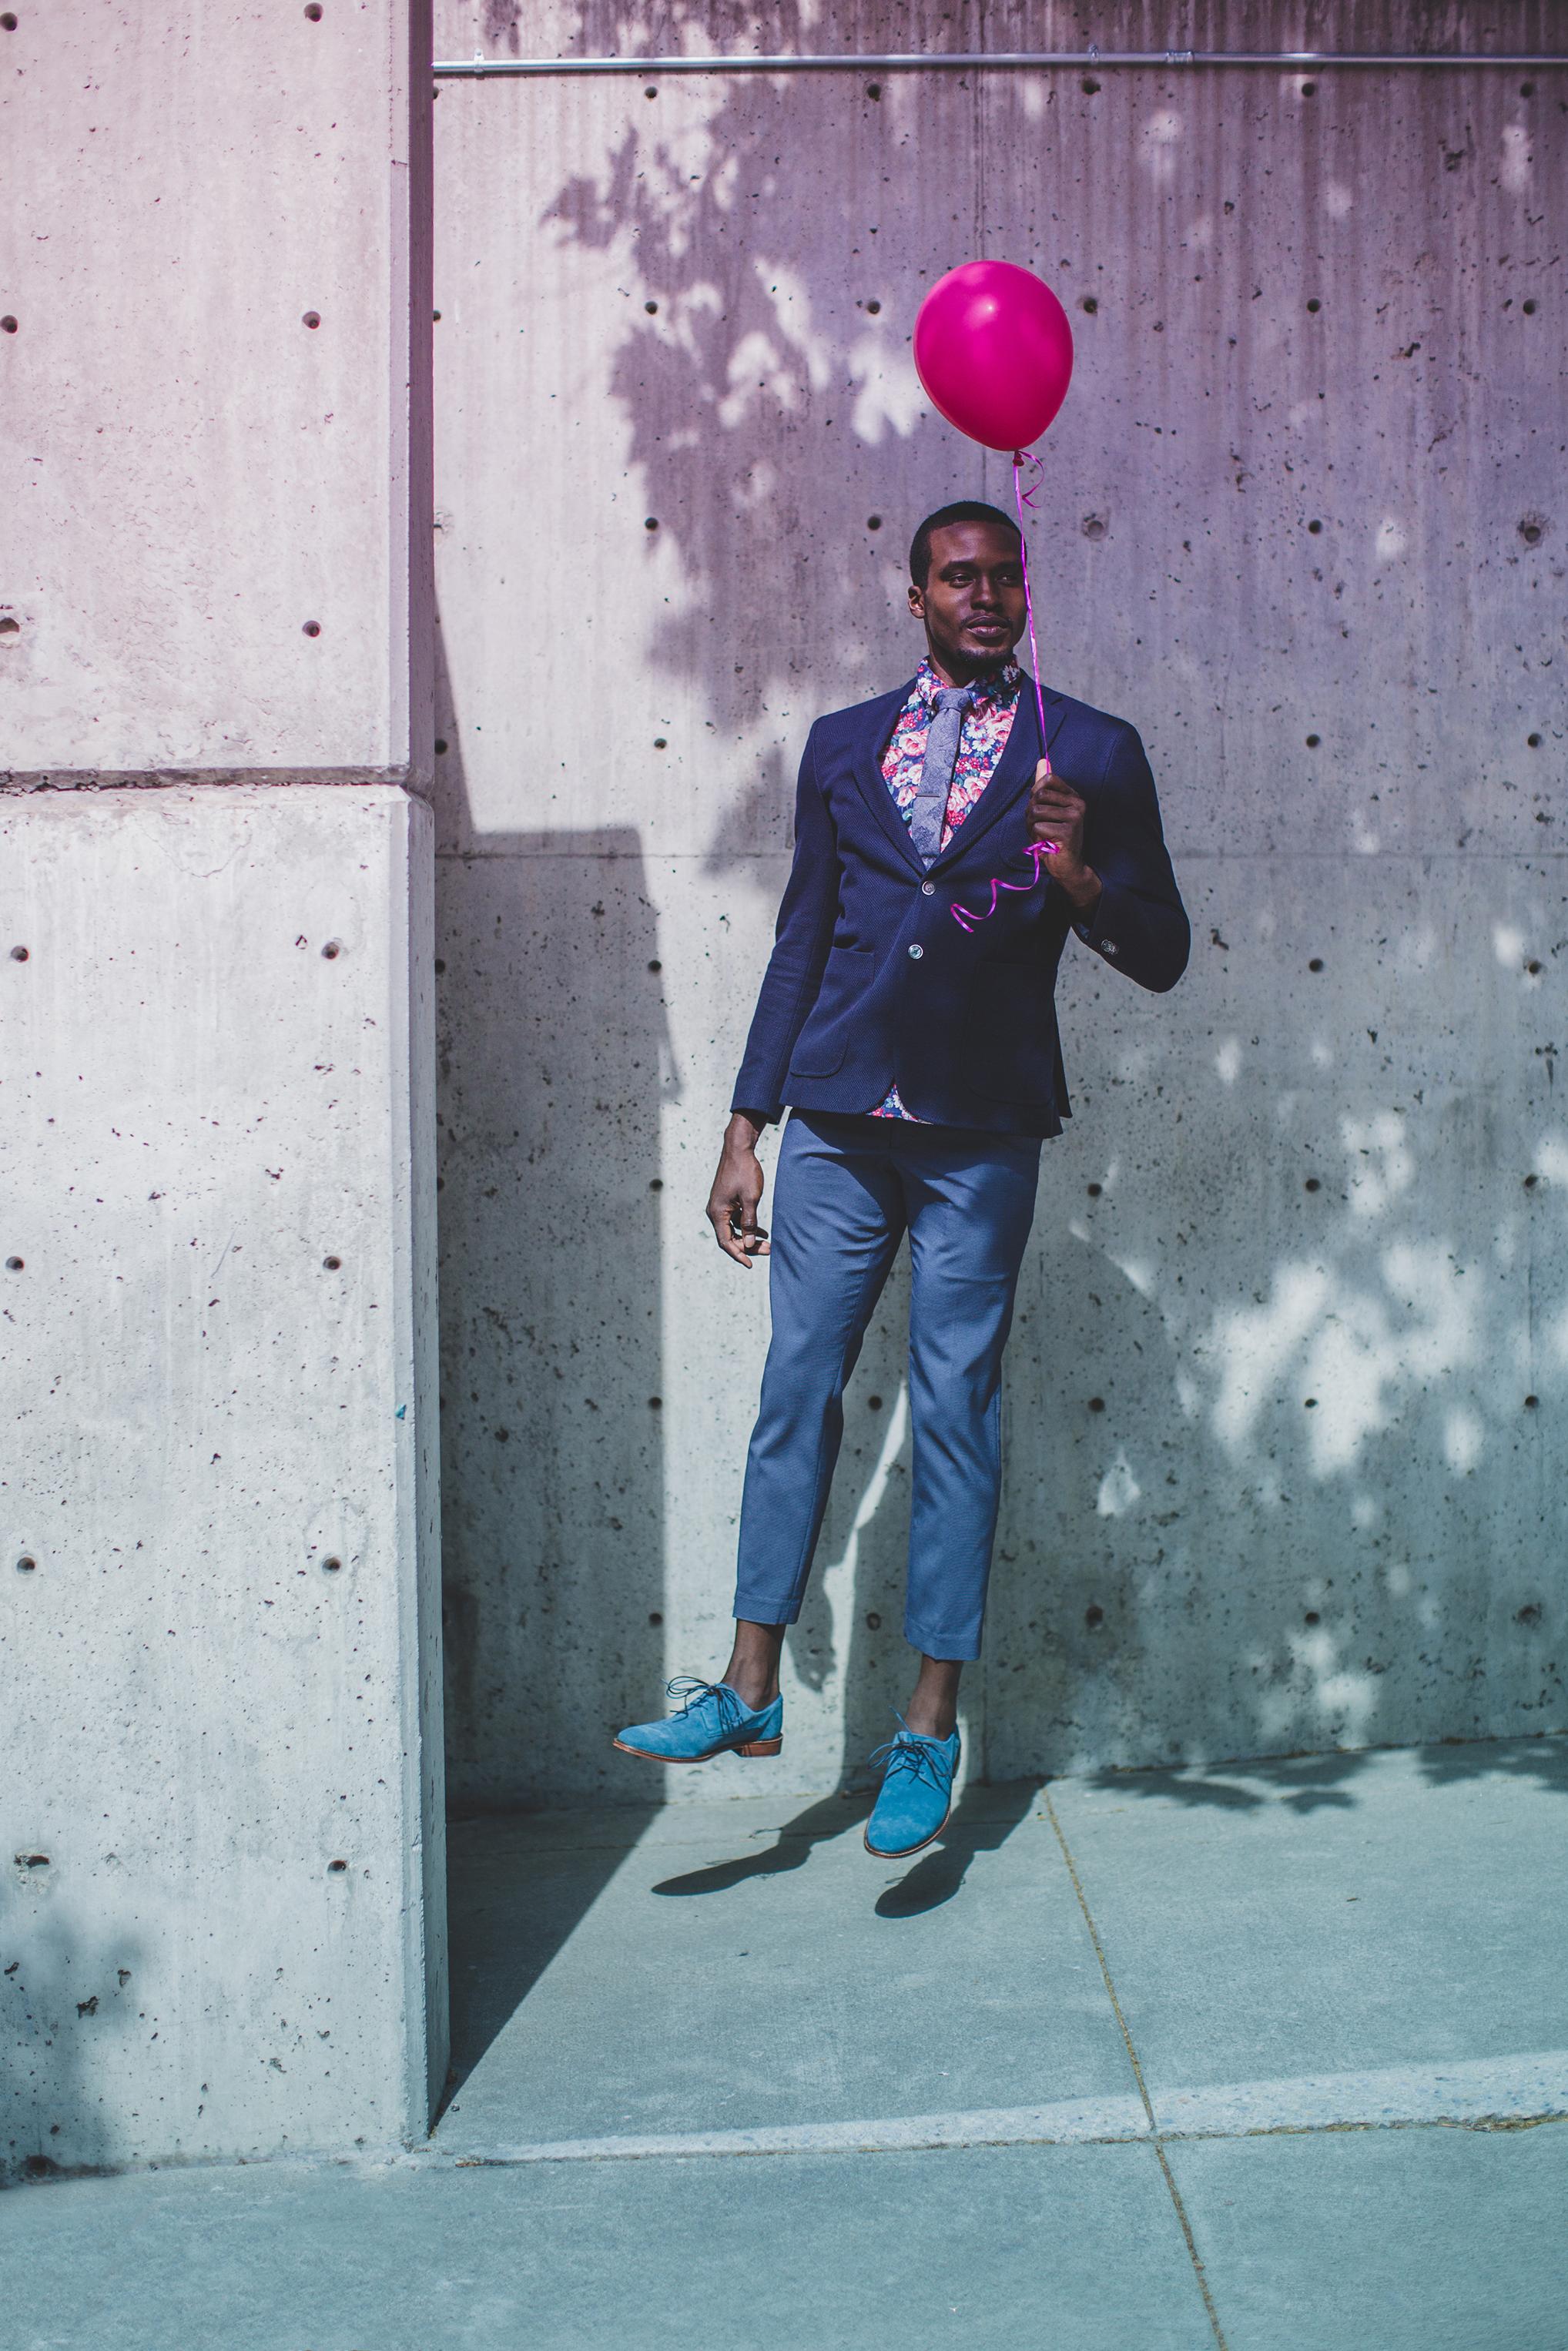 © duston-todd-pink-menswear-balloon-fashion-urban.jpg